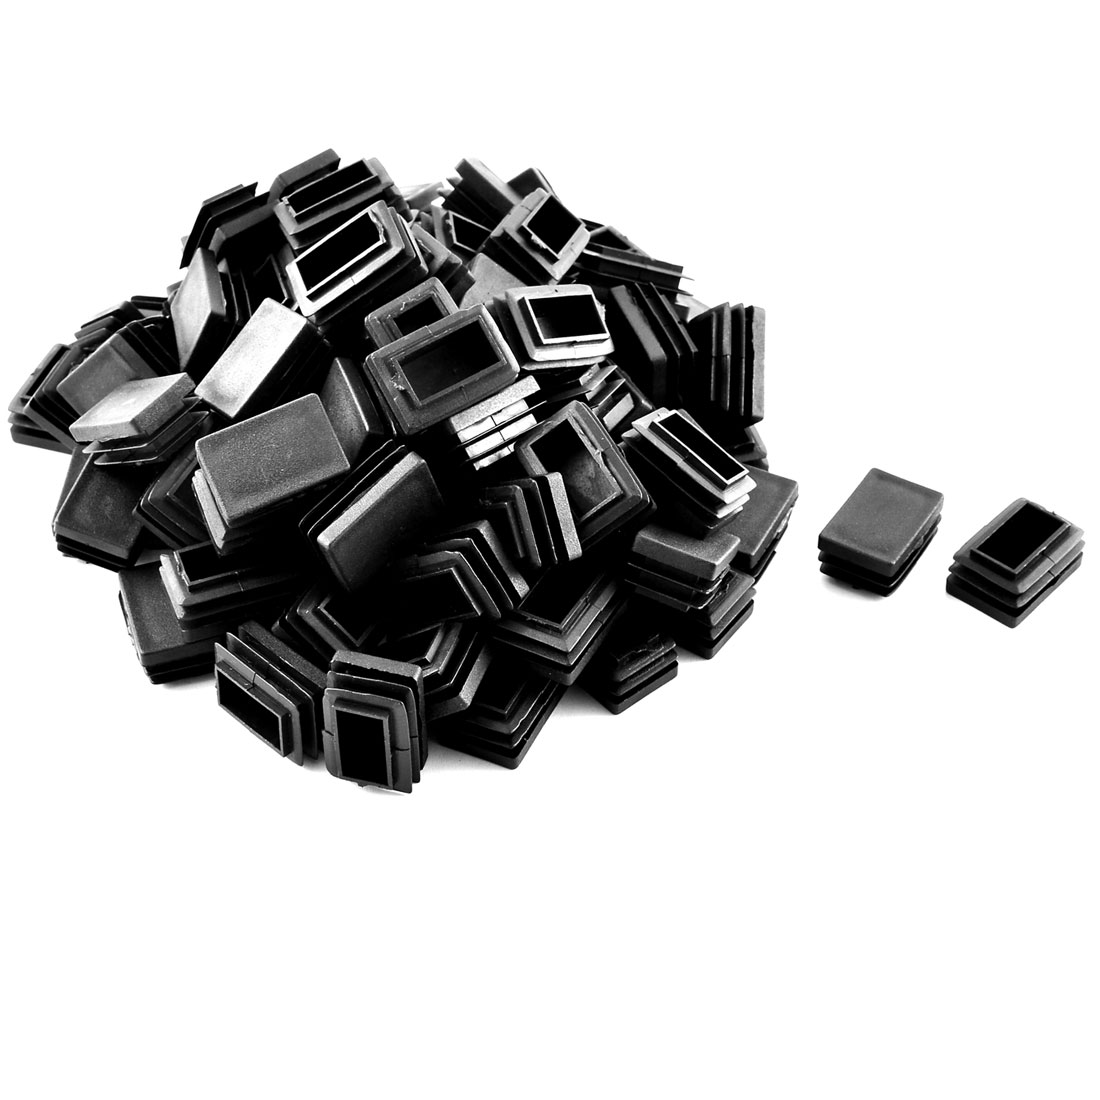 Home Plastic Rectangular Shaped Table Chair Leg Feet Tube Pipe Insert Black 100 Pcs